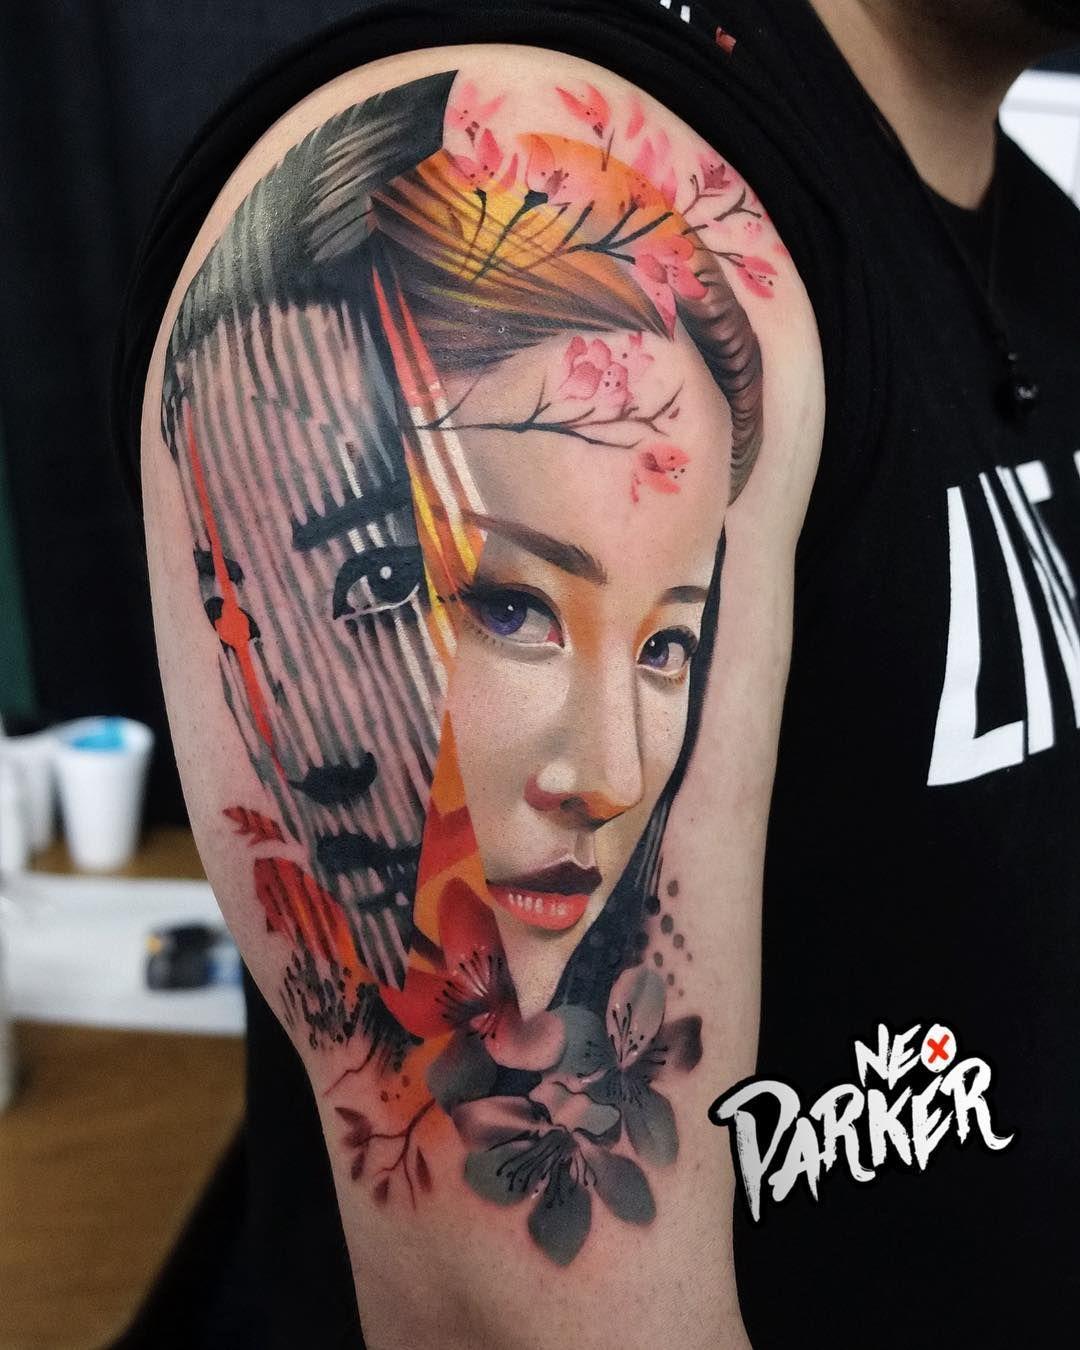 Tattoo Artist Neo Parker Rober Pedragosa Hinh Xăm Xăm